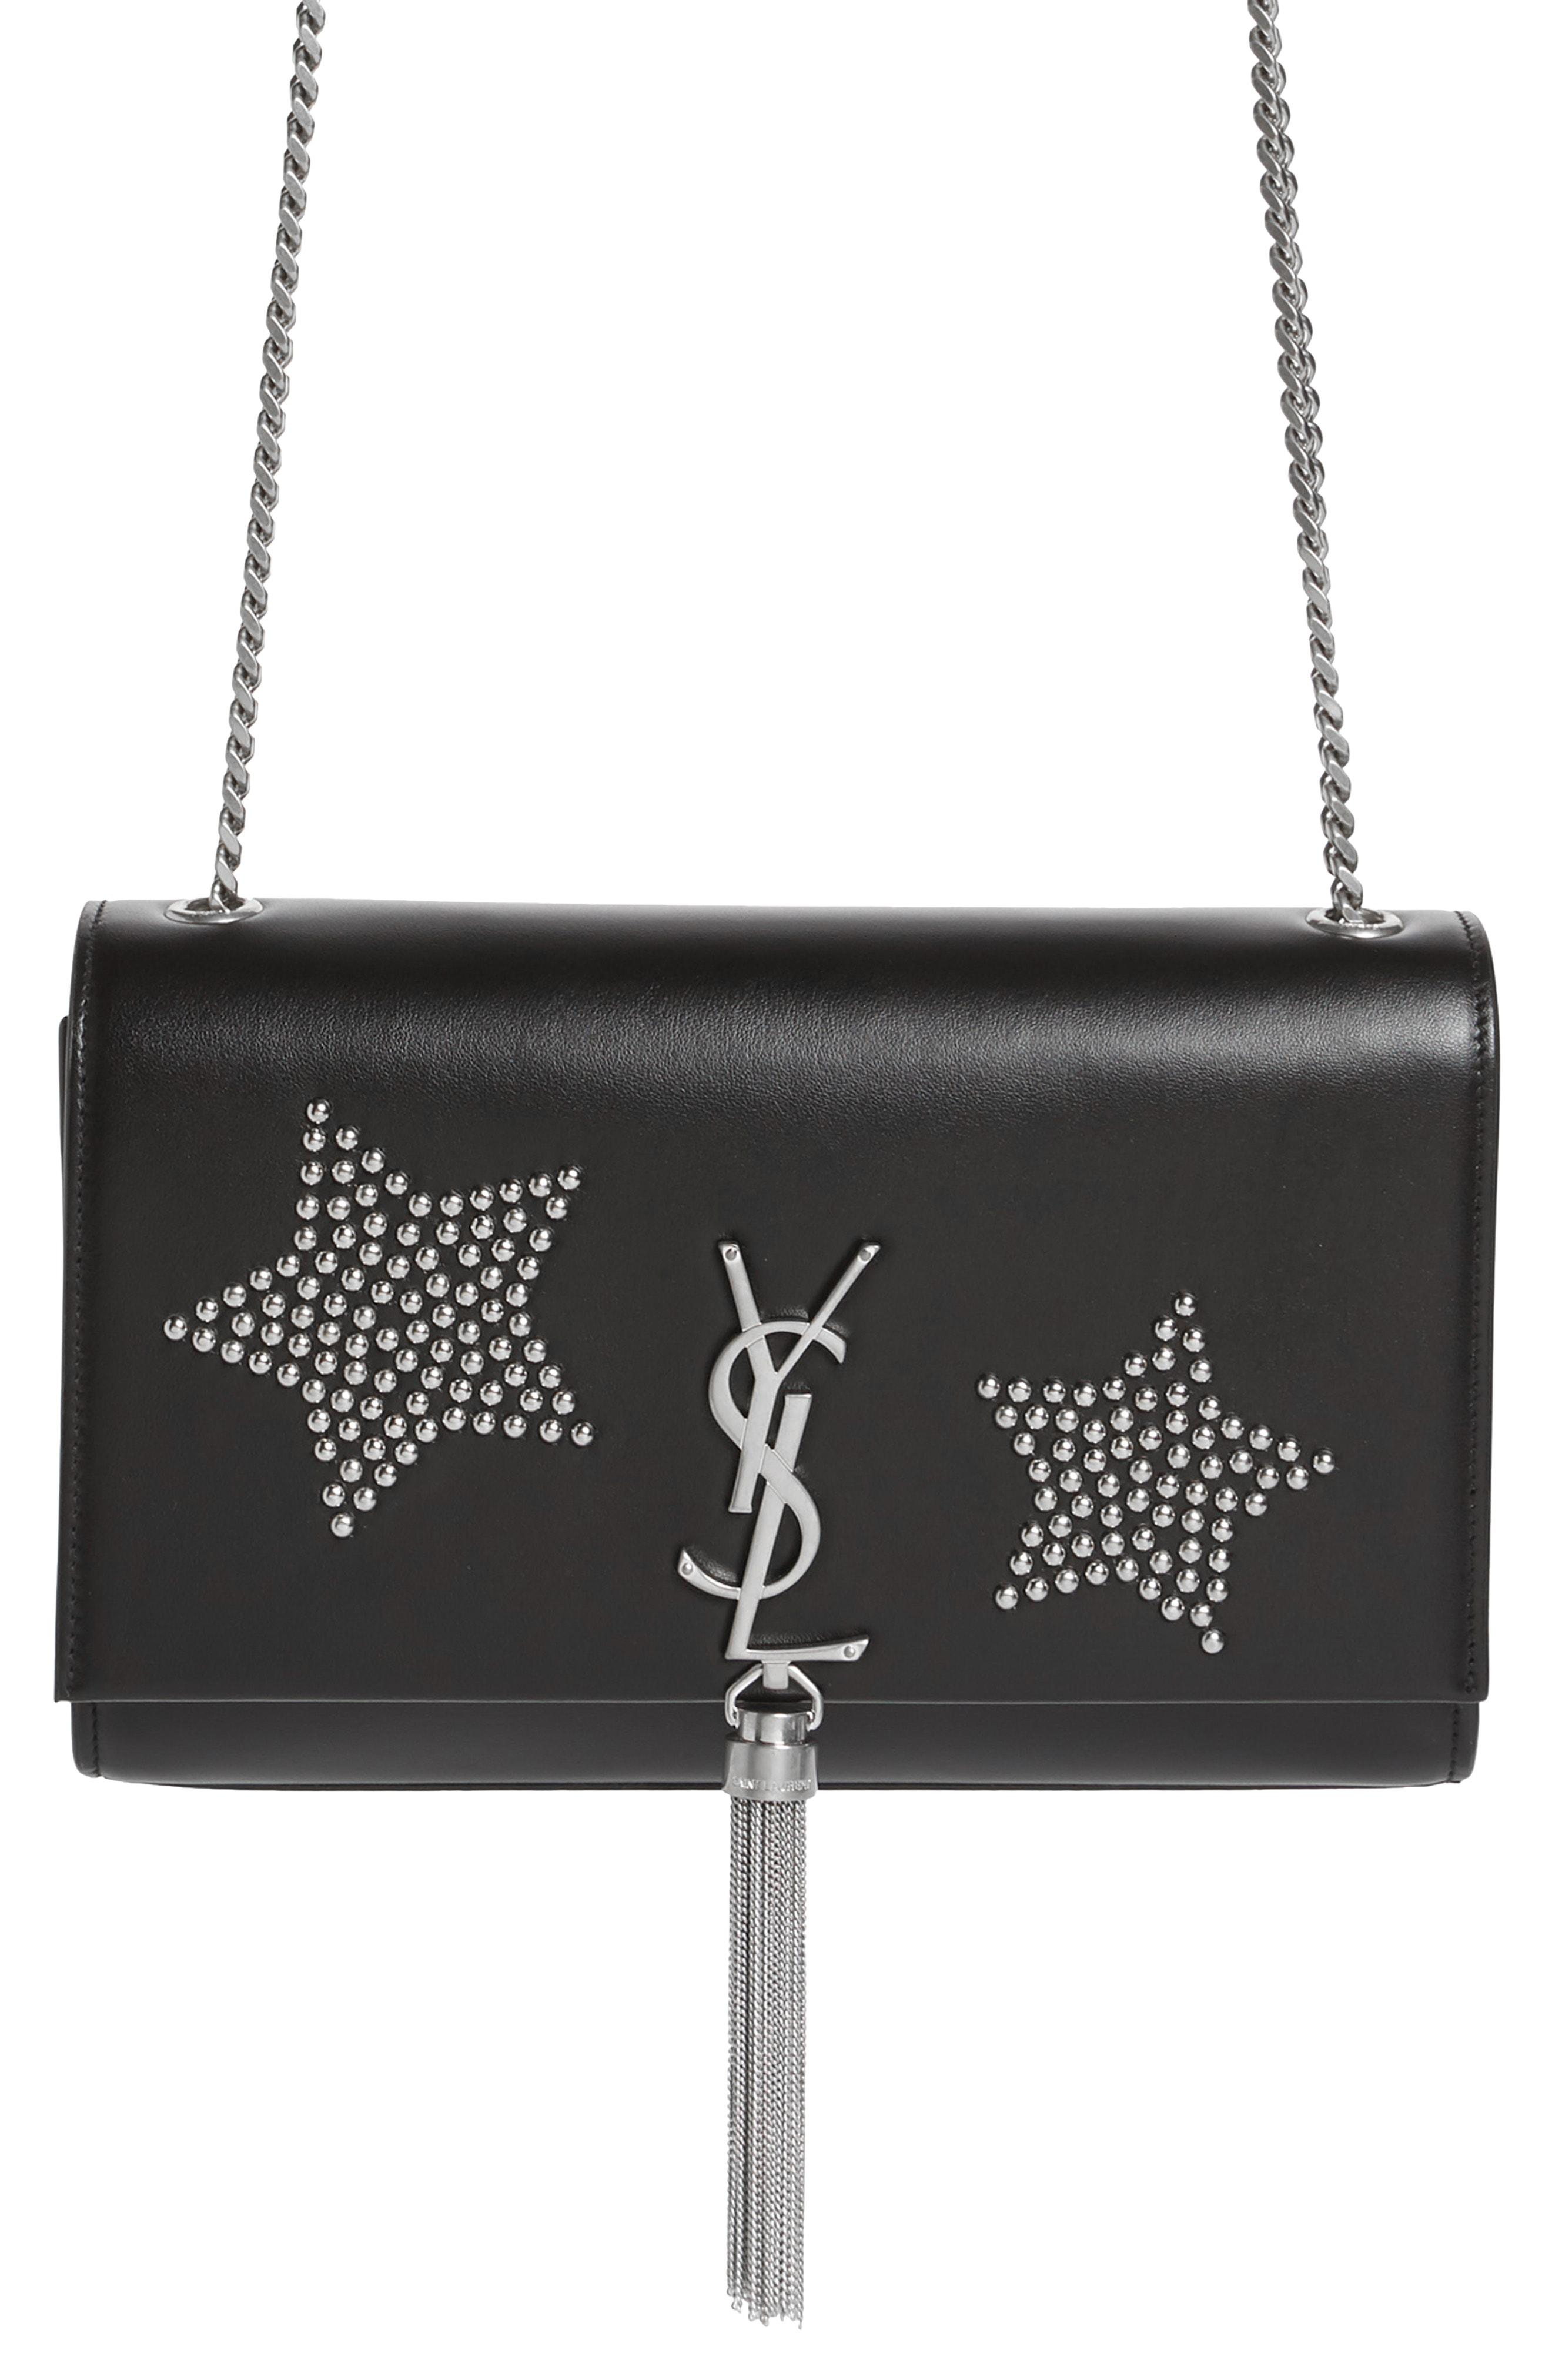 Lyst - Saint Laurent Medium Kate Tassel - Stars Leather Bag in Black dab820e2c8b72